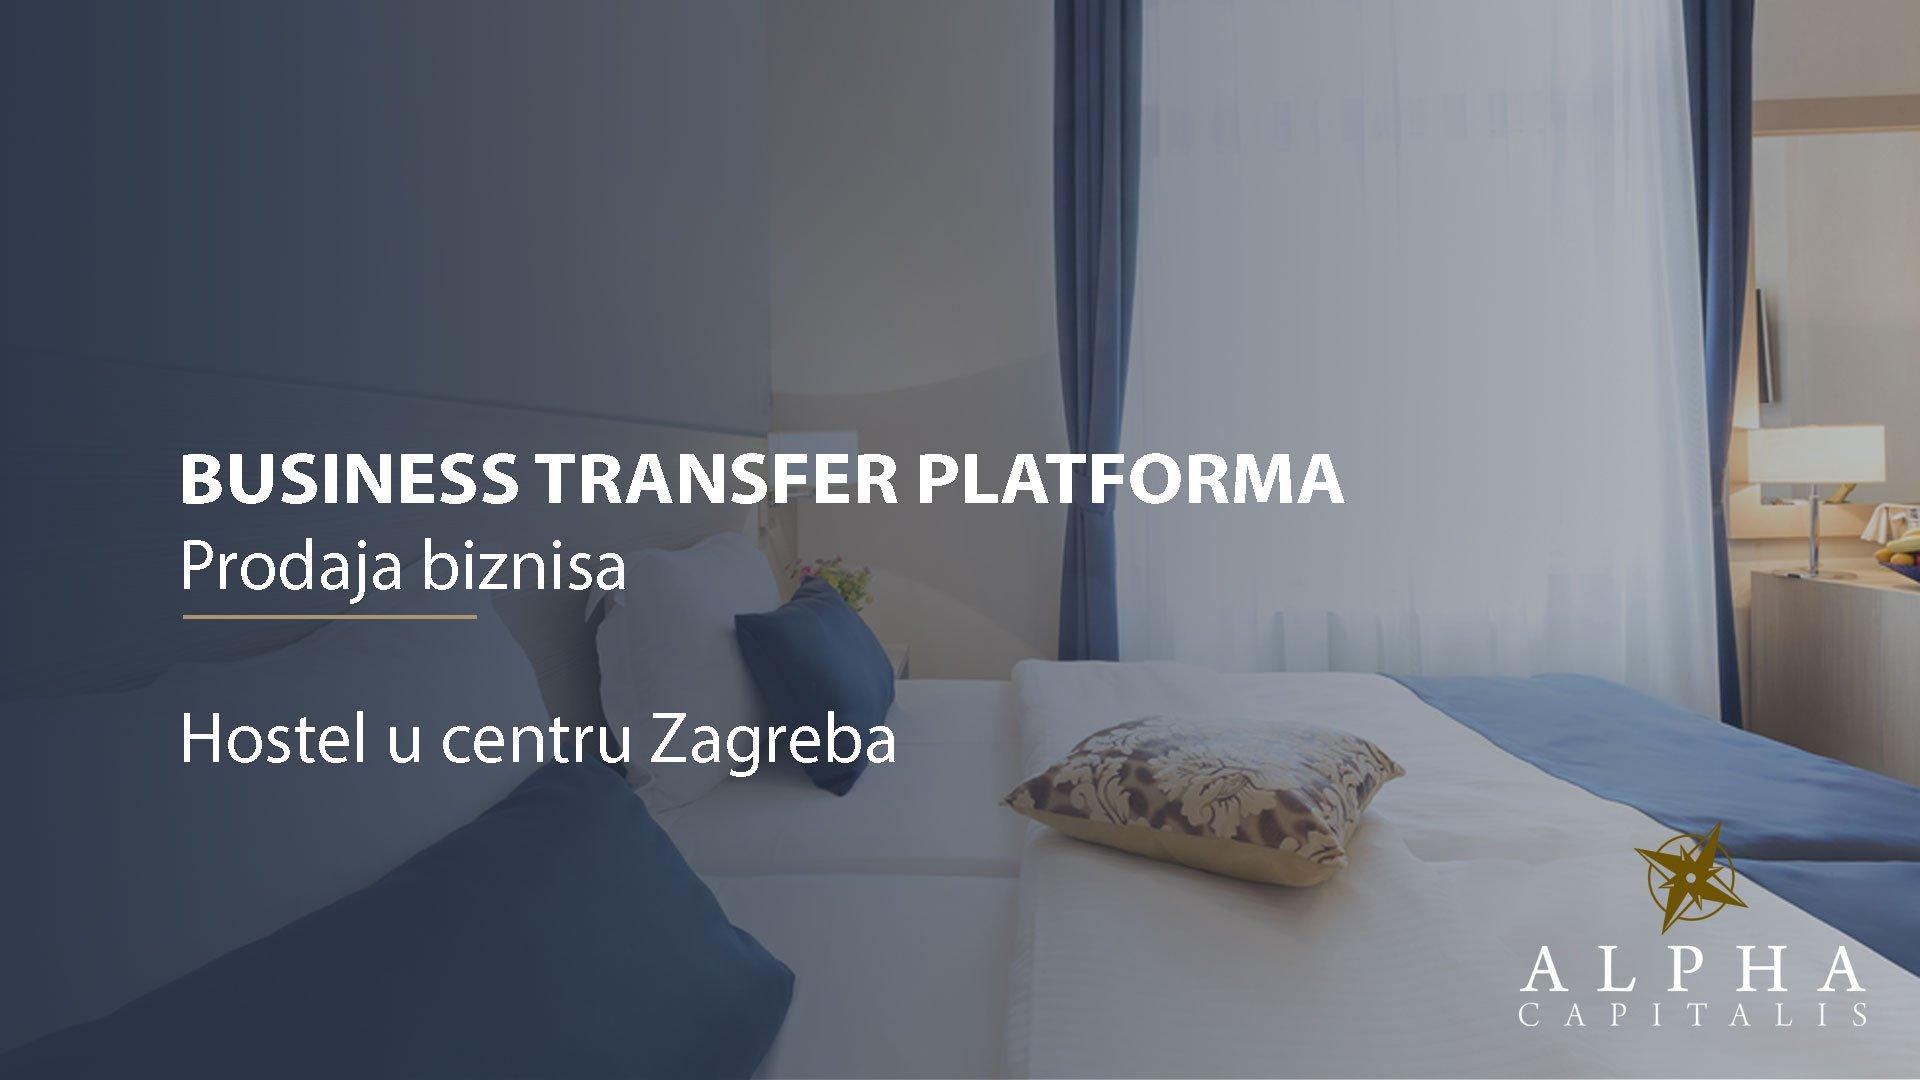 Business-transfer-platforma-prodaja-biznisa-hostel-u-centru-zagreba